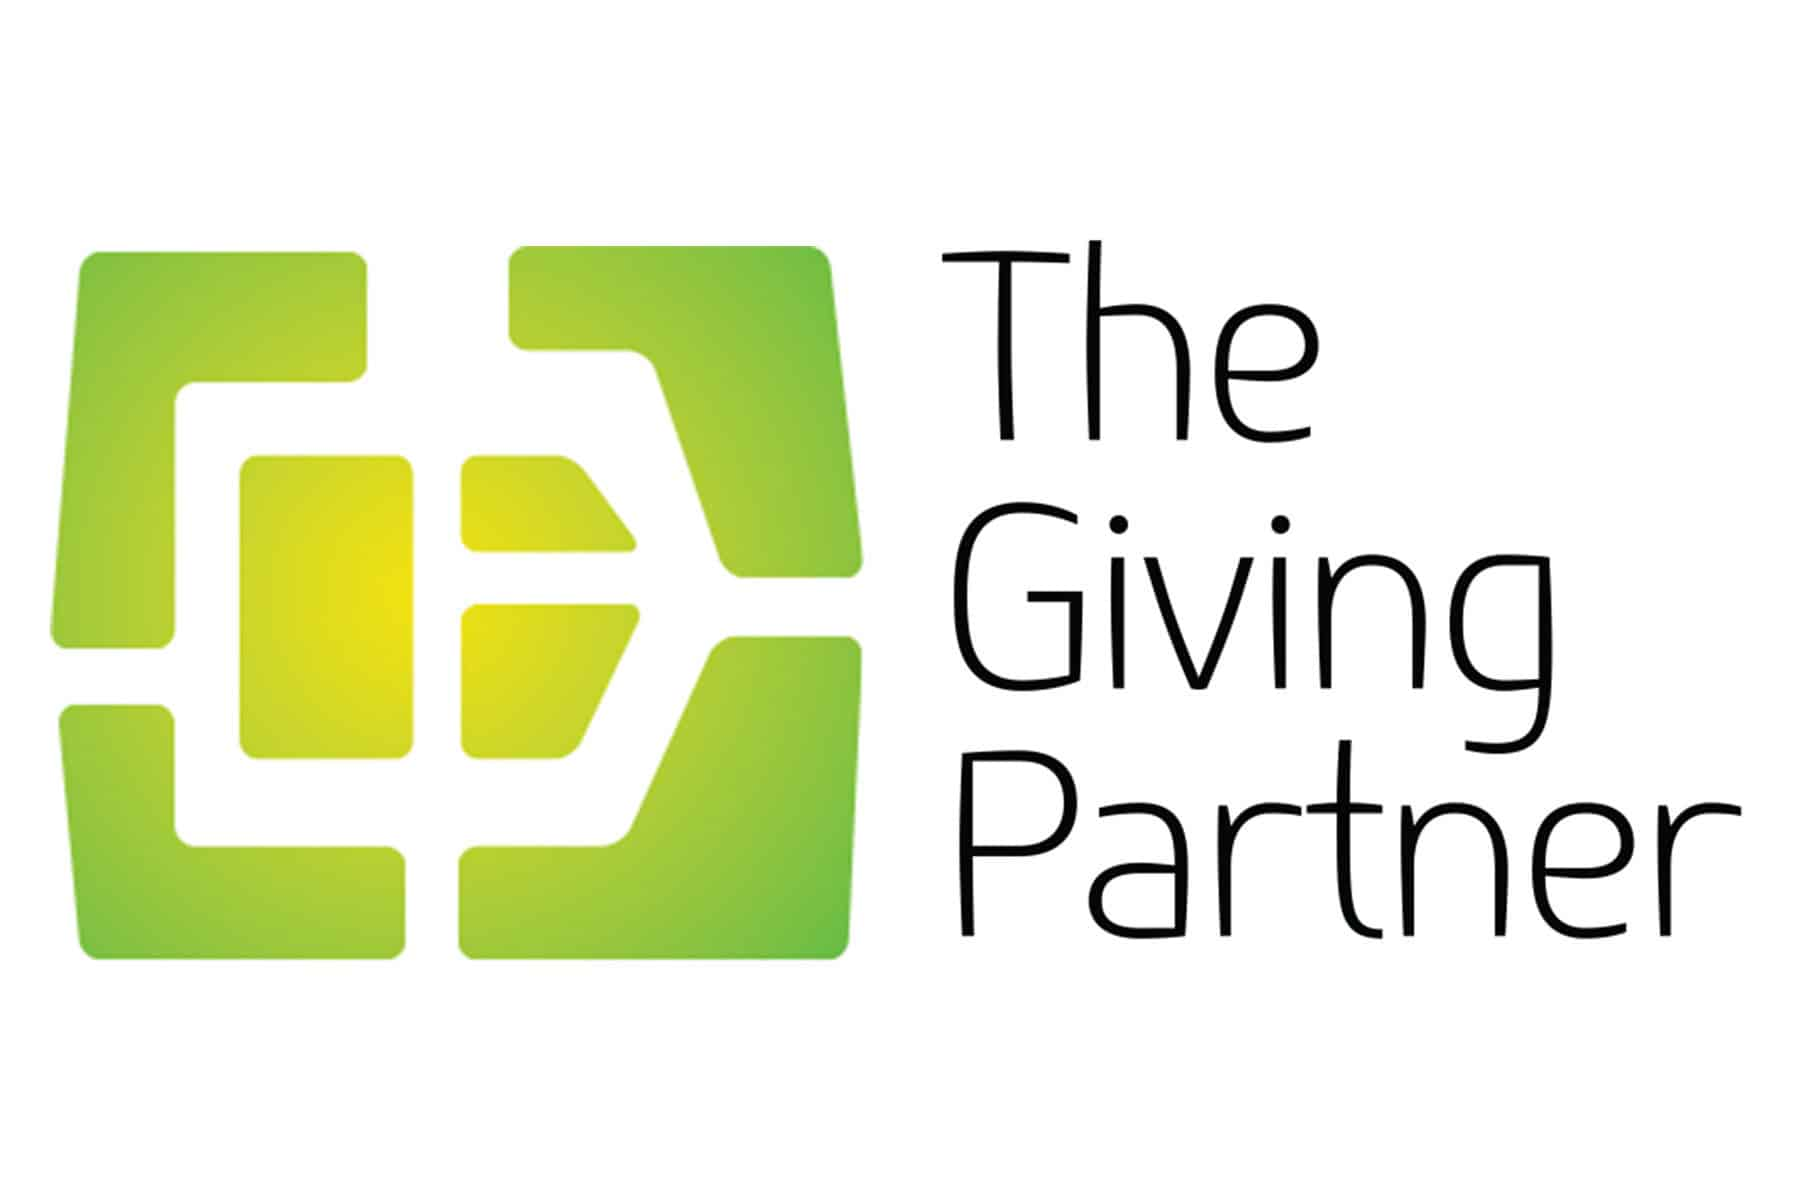 Friendship Centers Giving Partner